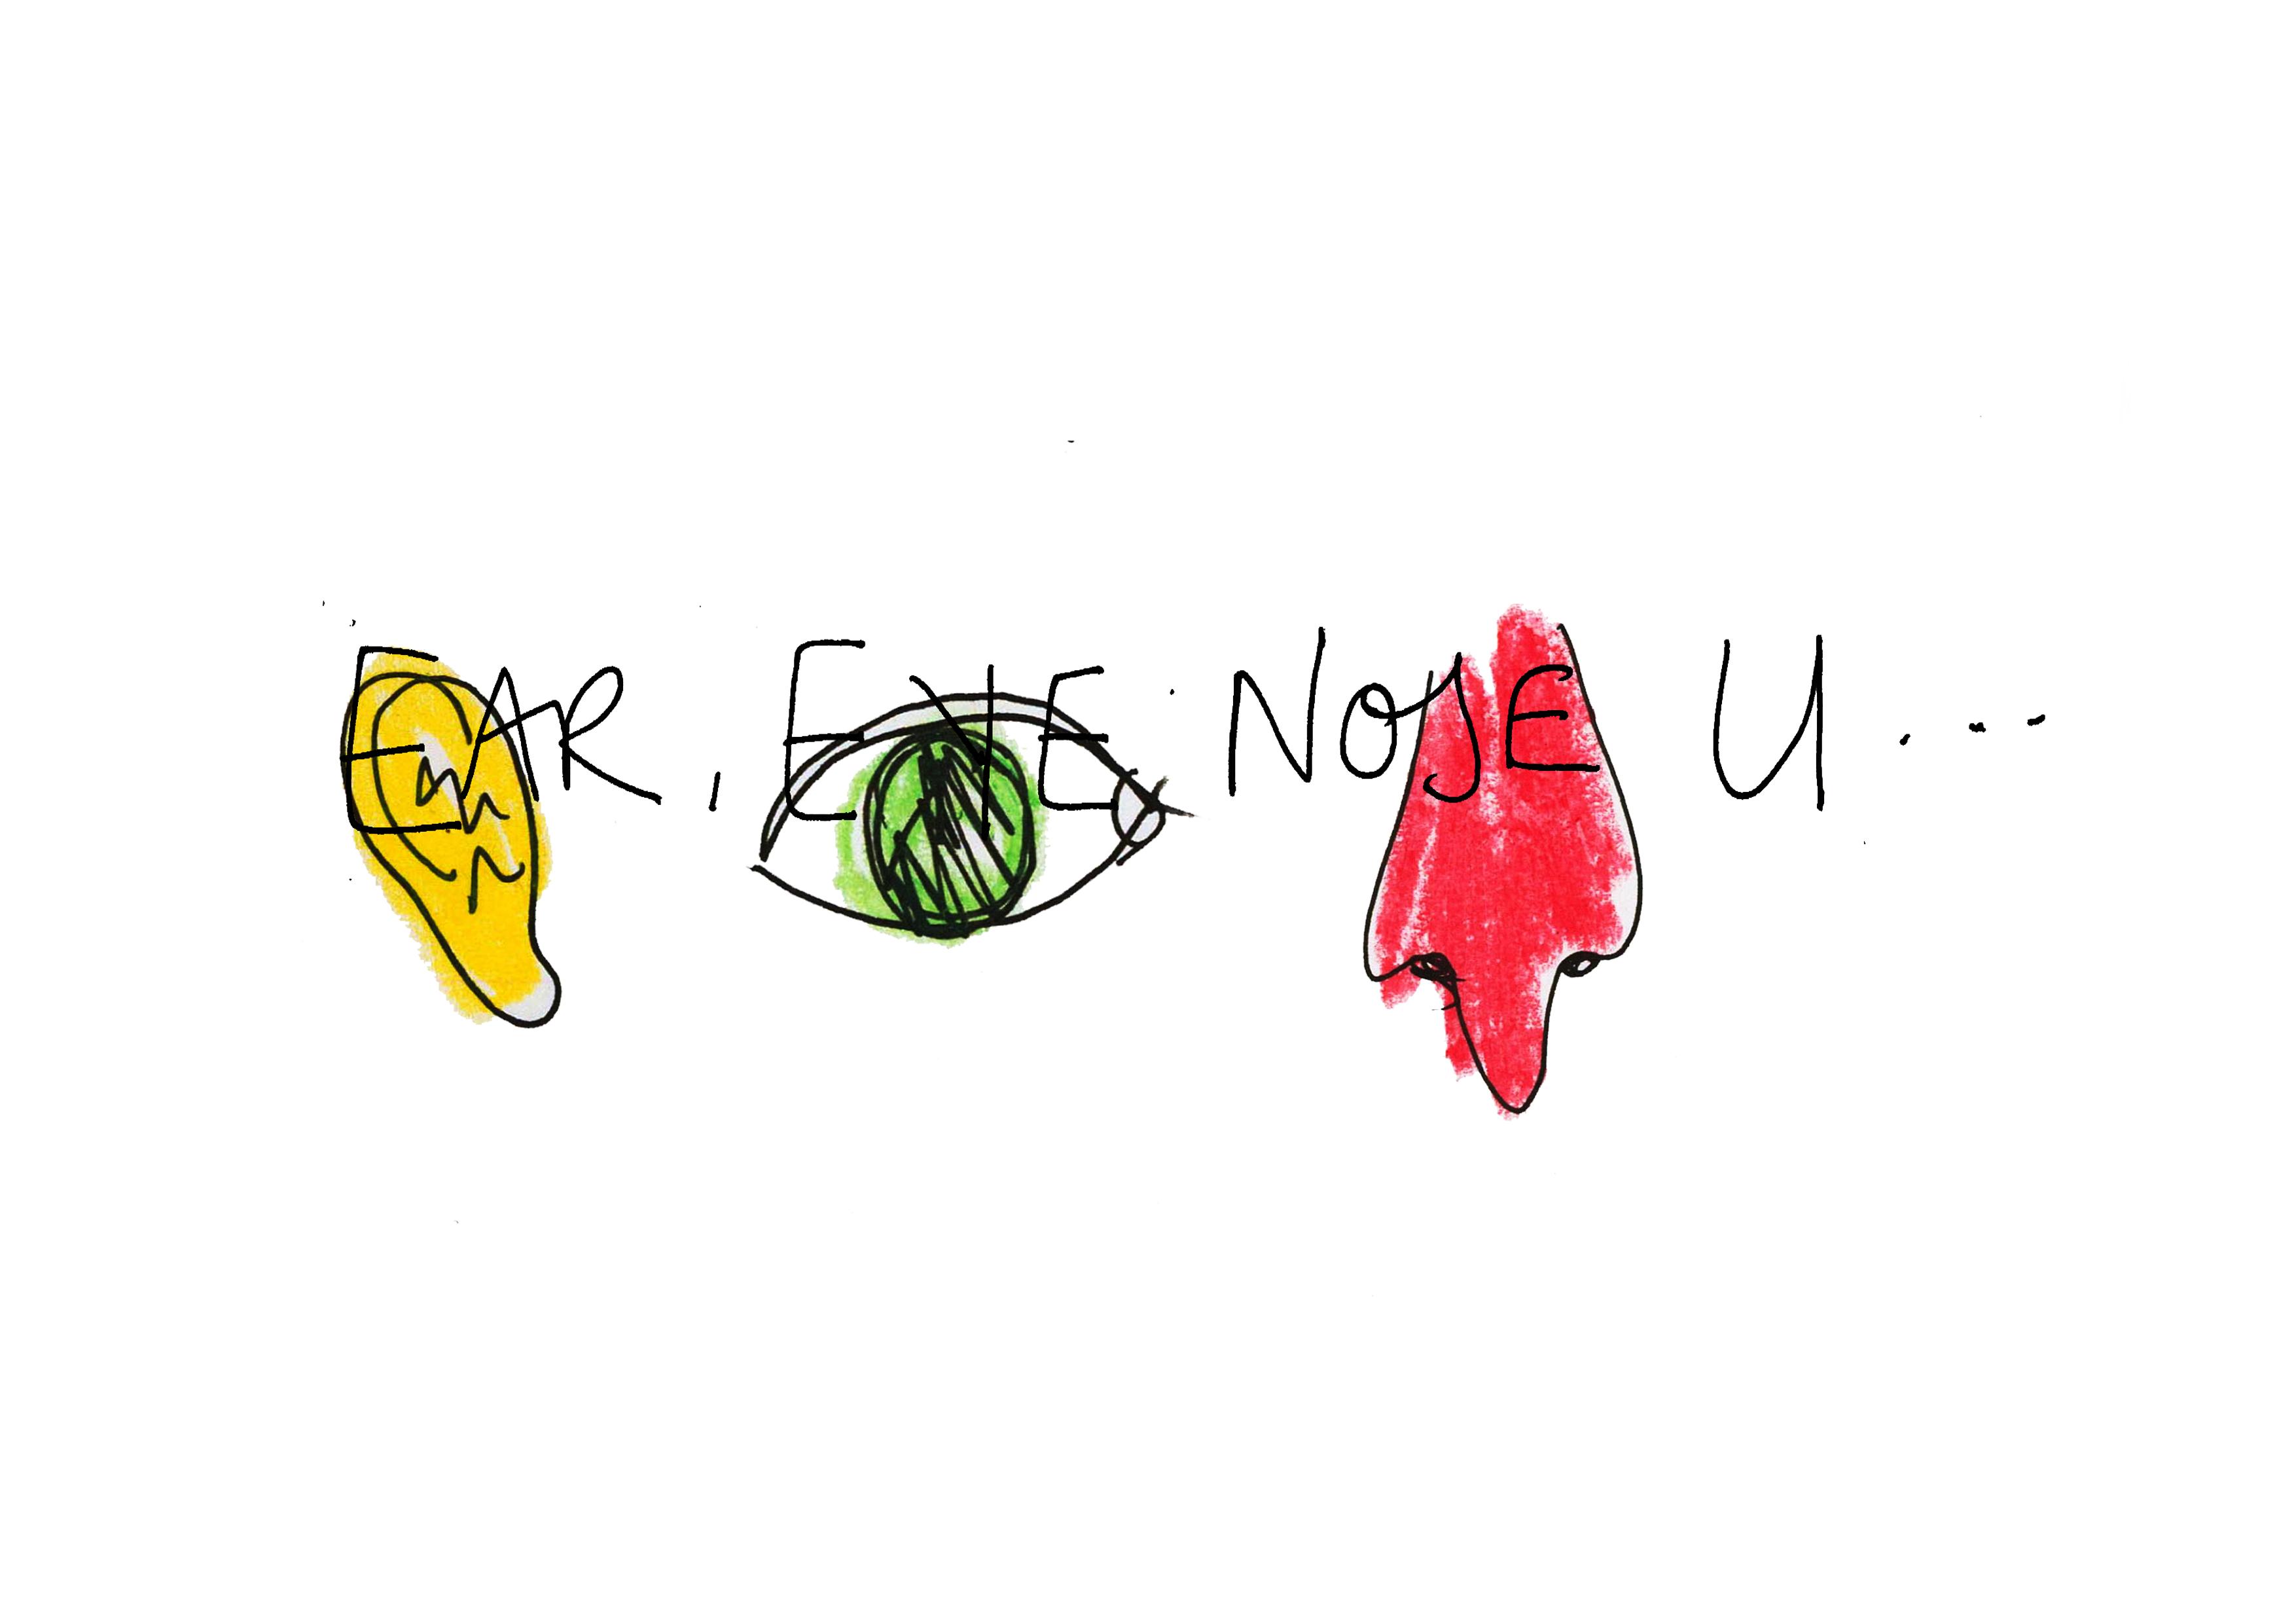 EAR EYE NOSE U